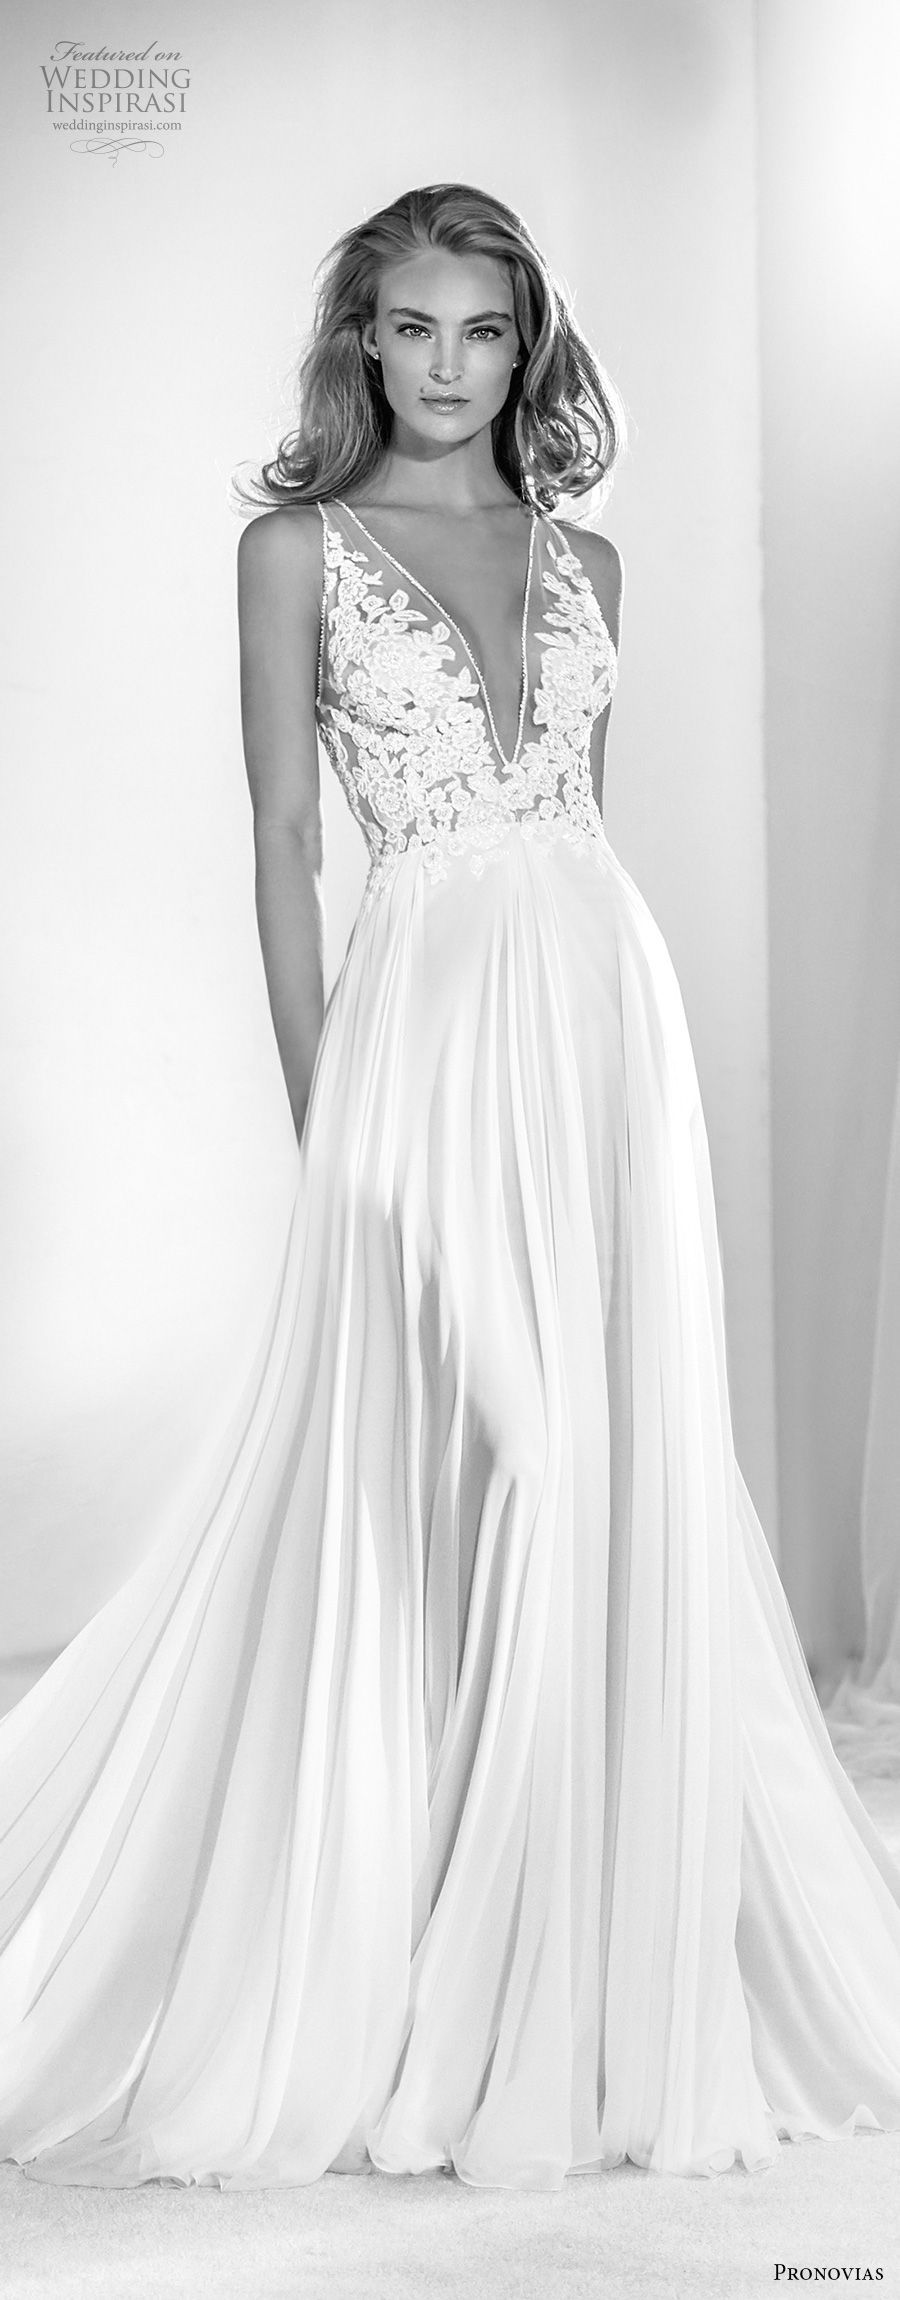 Atelier pronovias wedding dresses atelier pronovias atelier